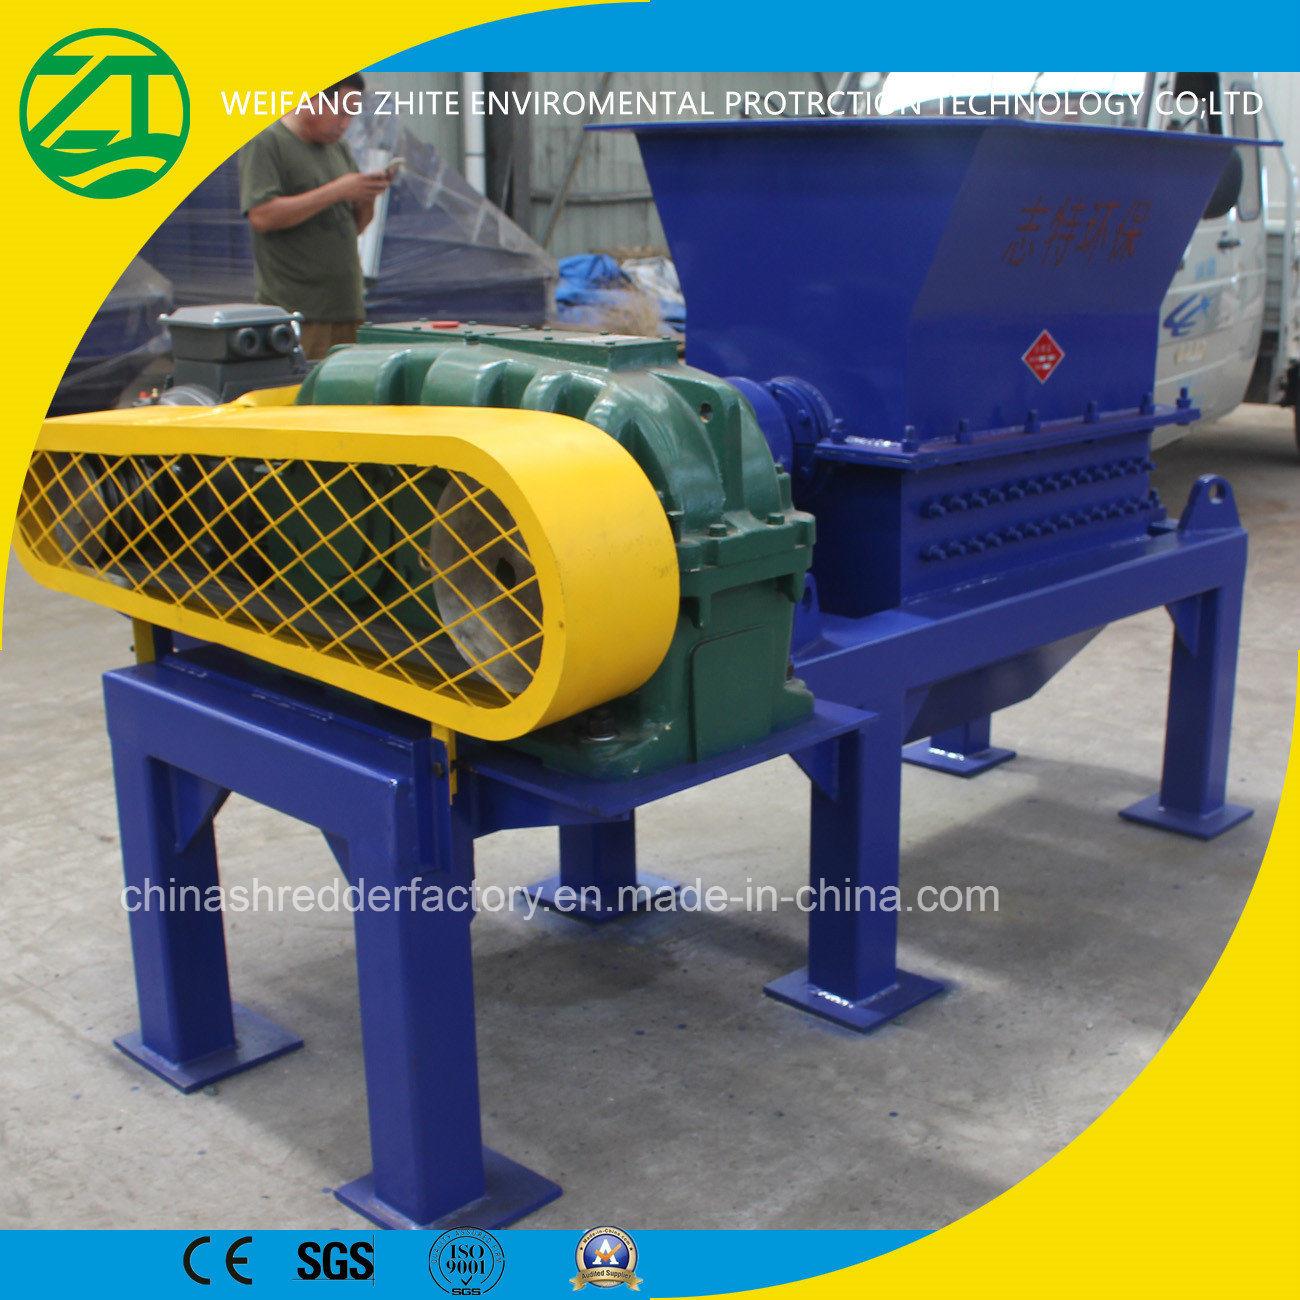 Single Shaft Shredder for Animal Carcasses Kitchen Waste/Municipal Solid Waste/Wood/Tire